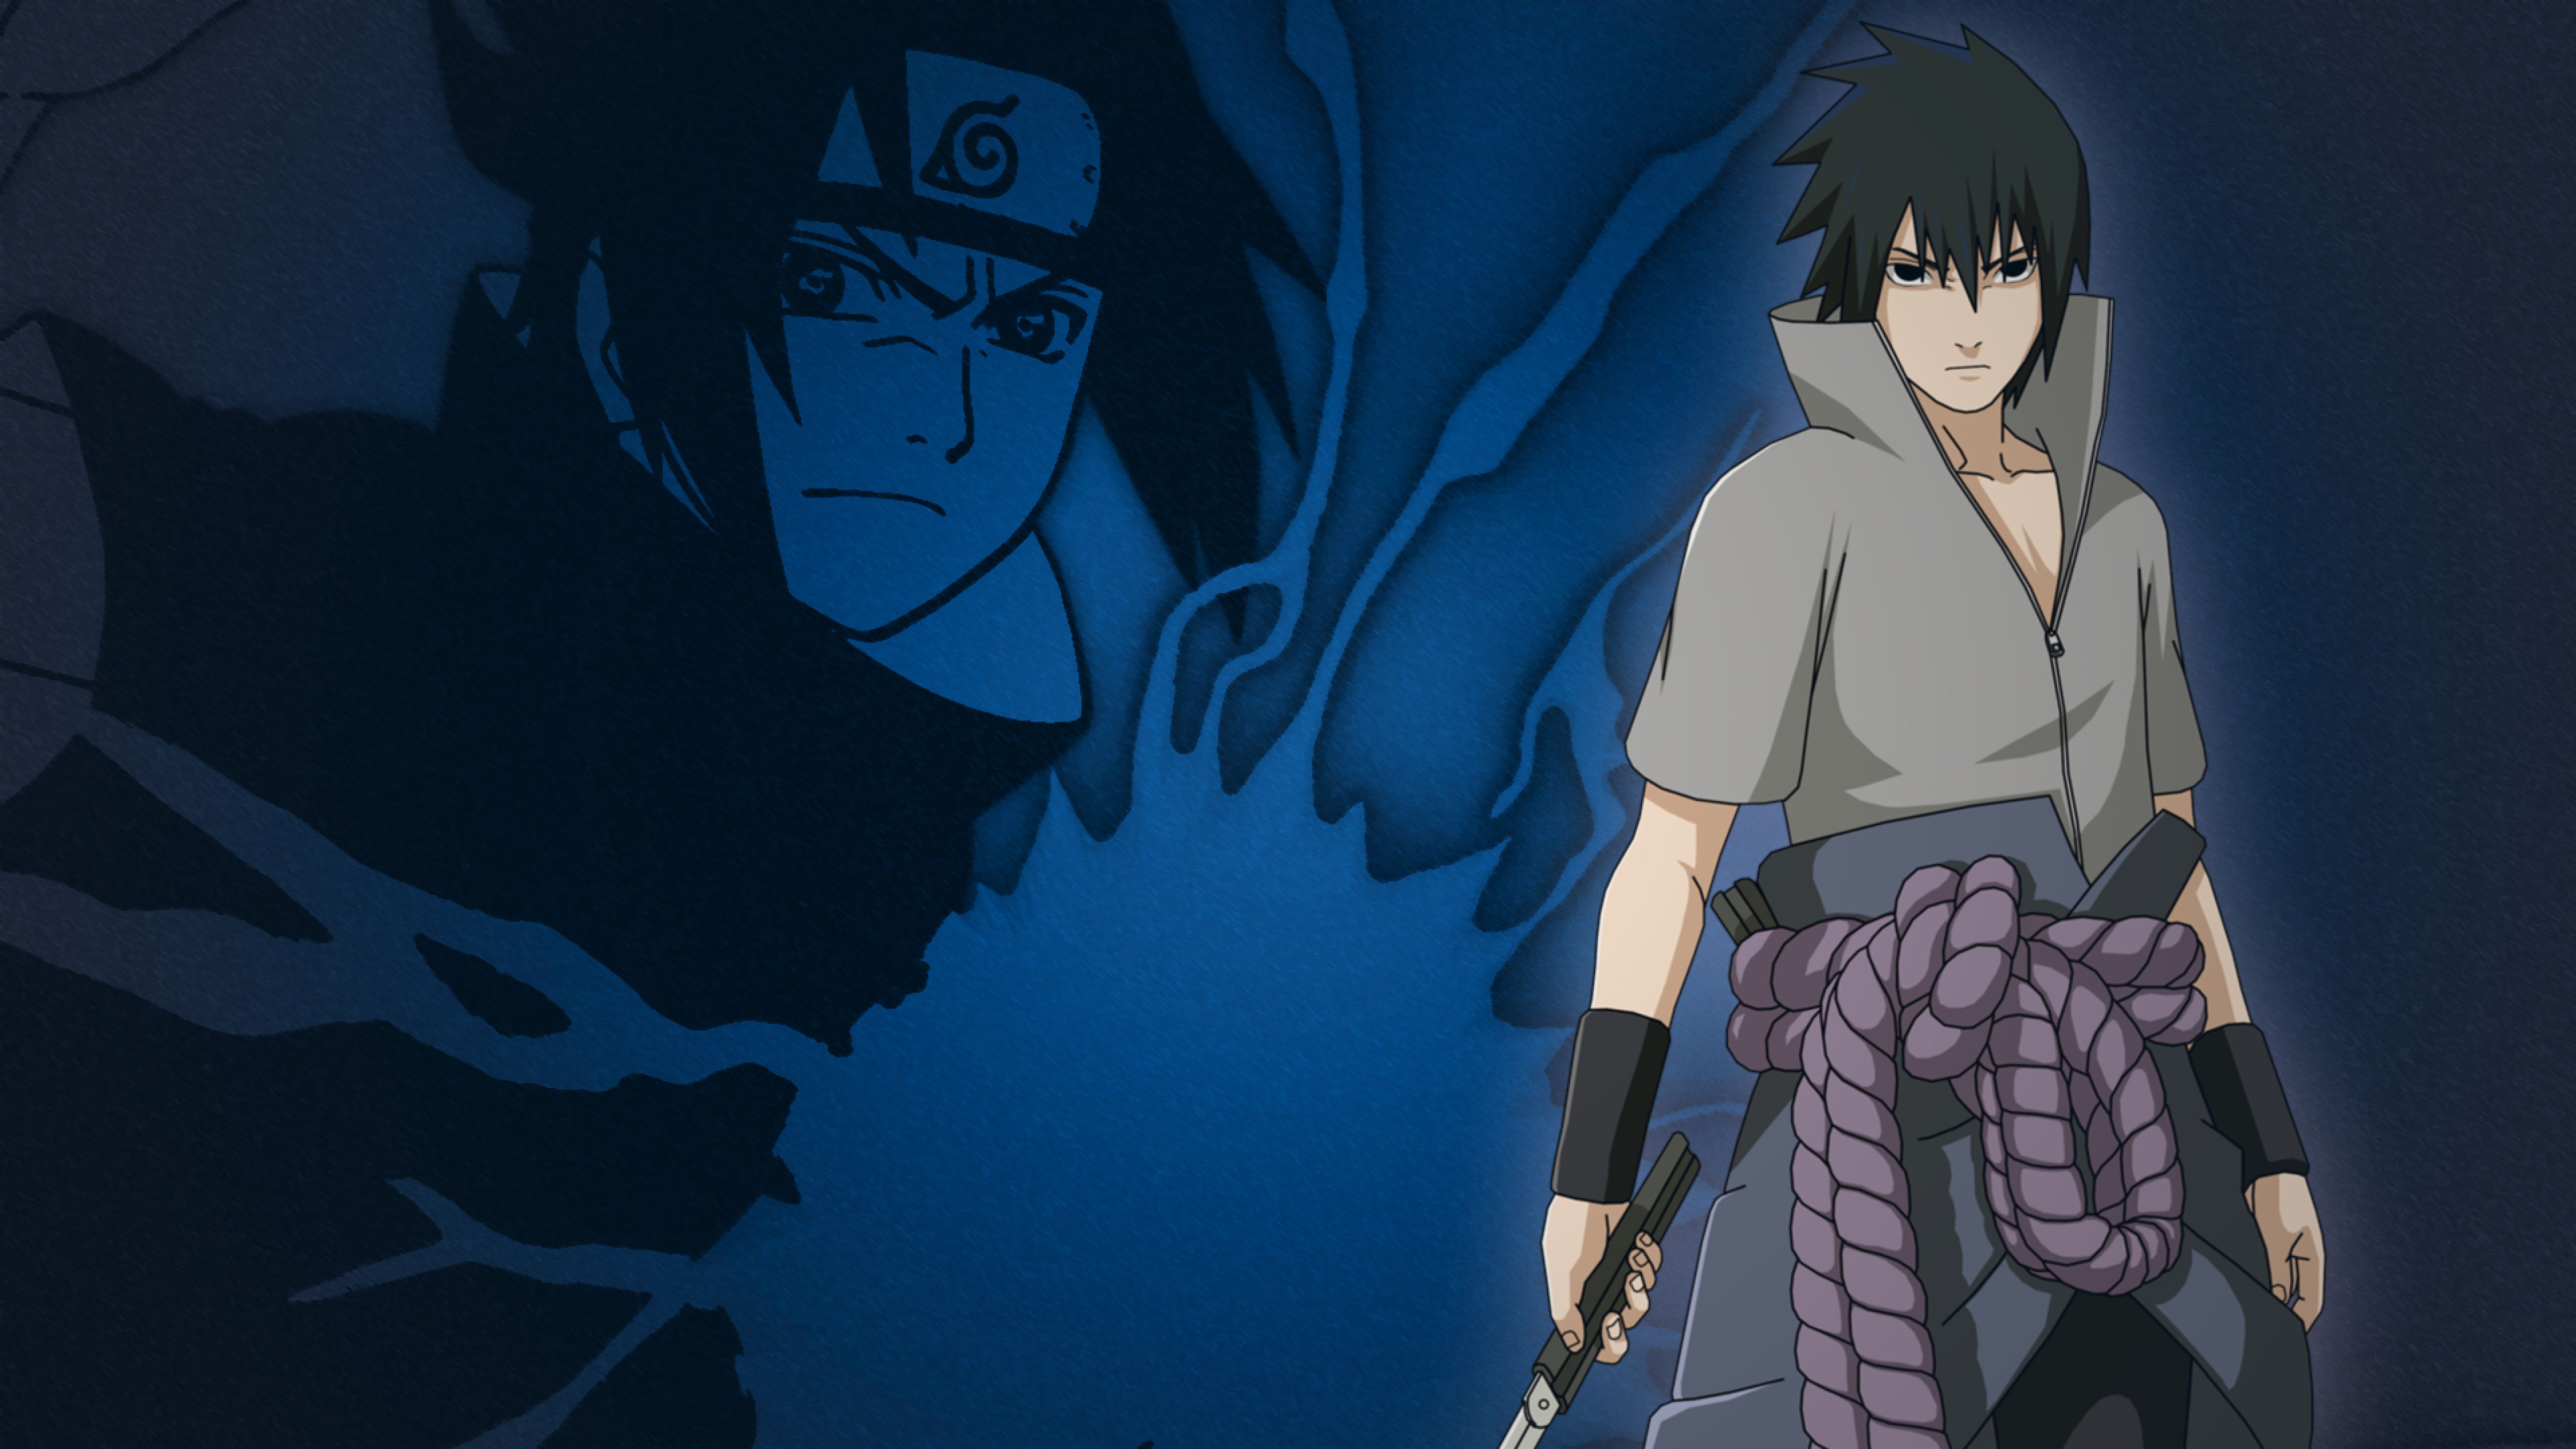 Naruto 5120x2880 Wallpapers Top Free Naruto 5120x2880 Backgrounds Wallpaperaccess